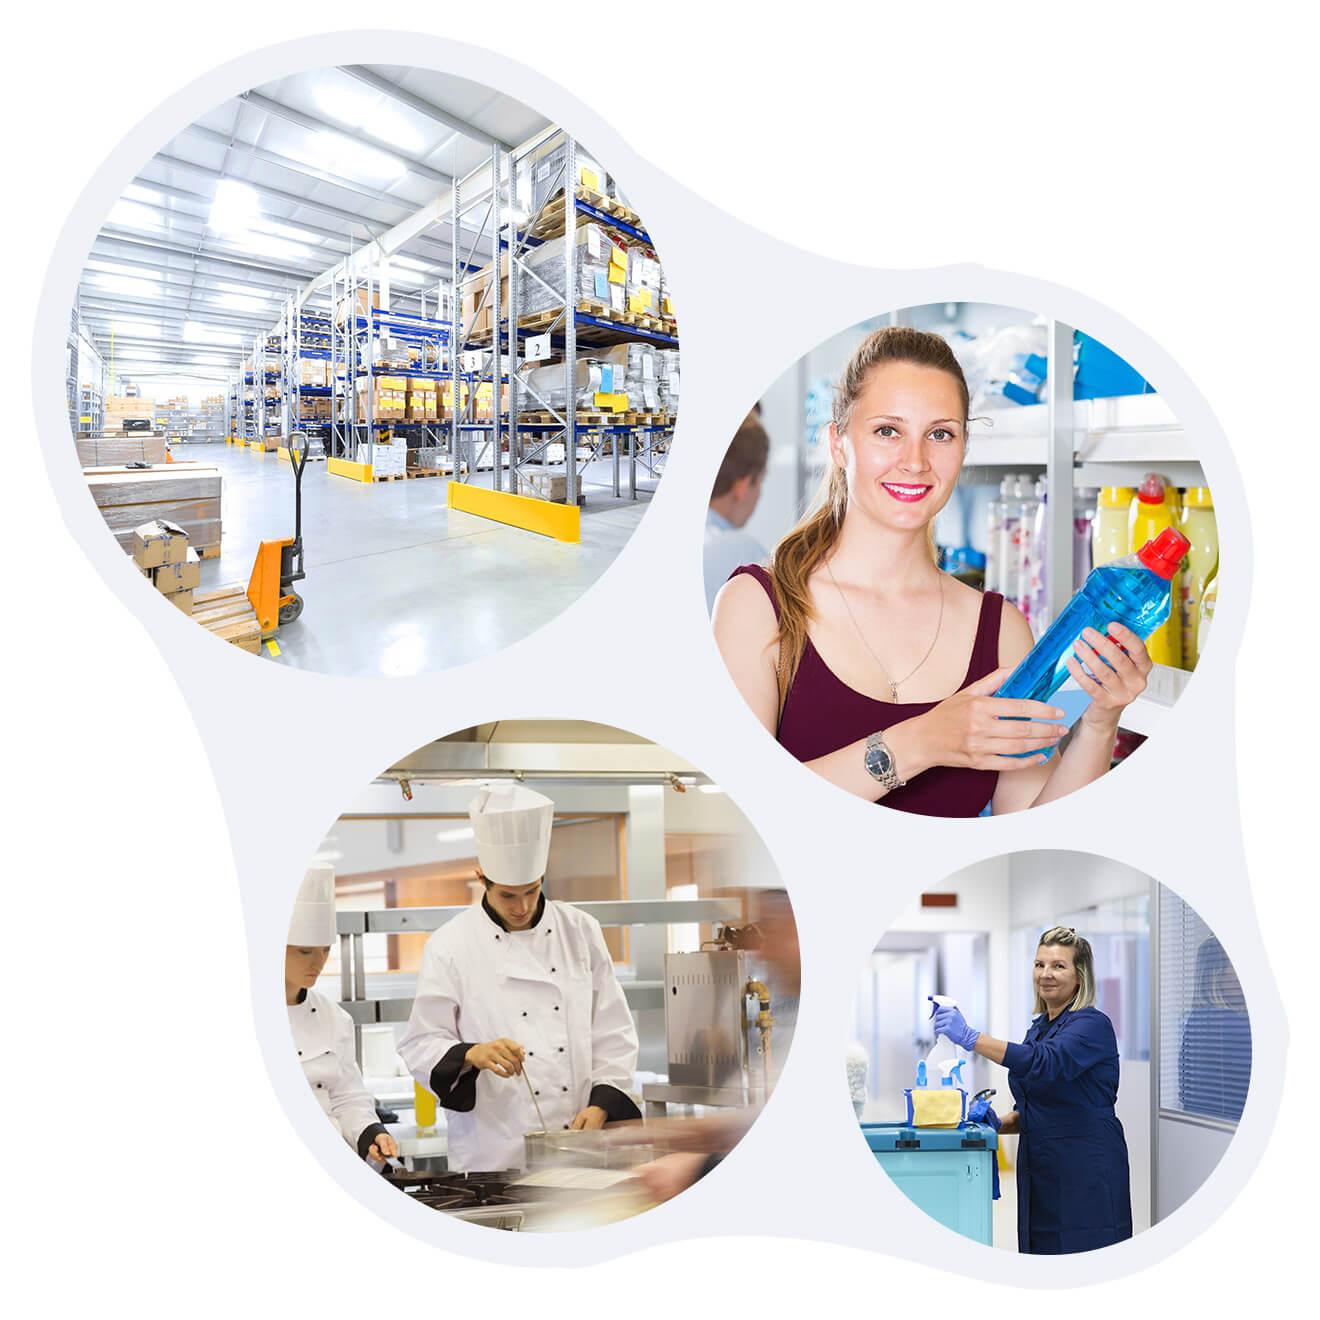 BioSafe Organics Cleaning